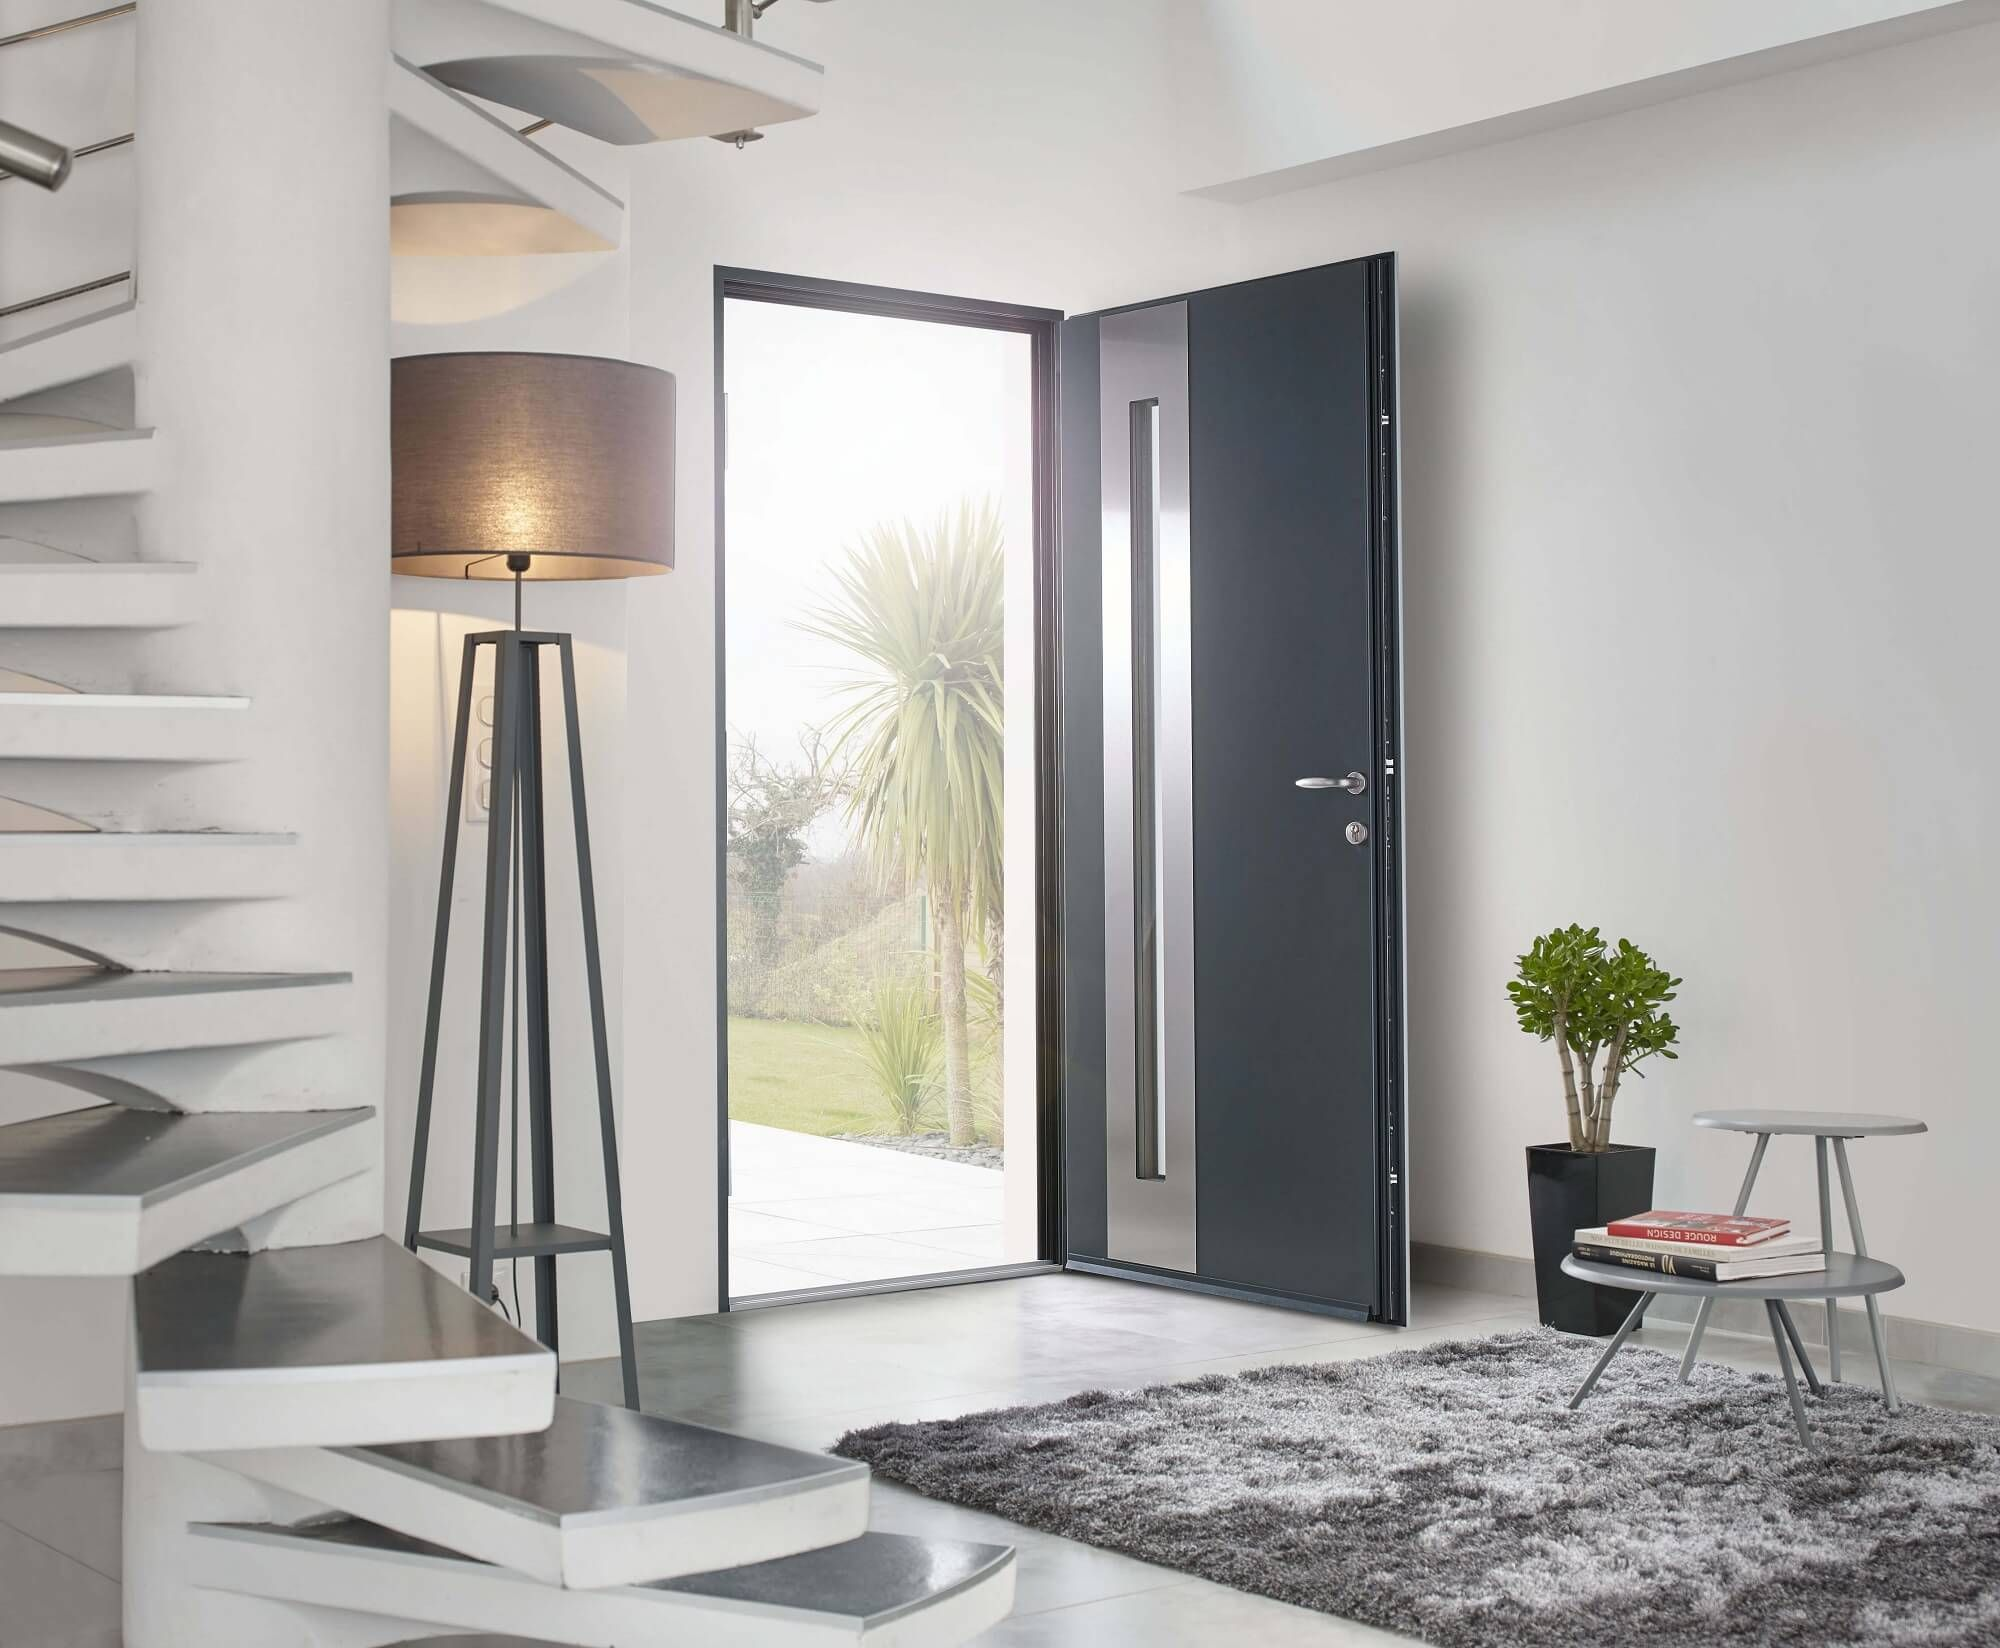 Large Choix De Portes Dentrée Creation Surmesure Interiors - Porte aluminium